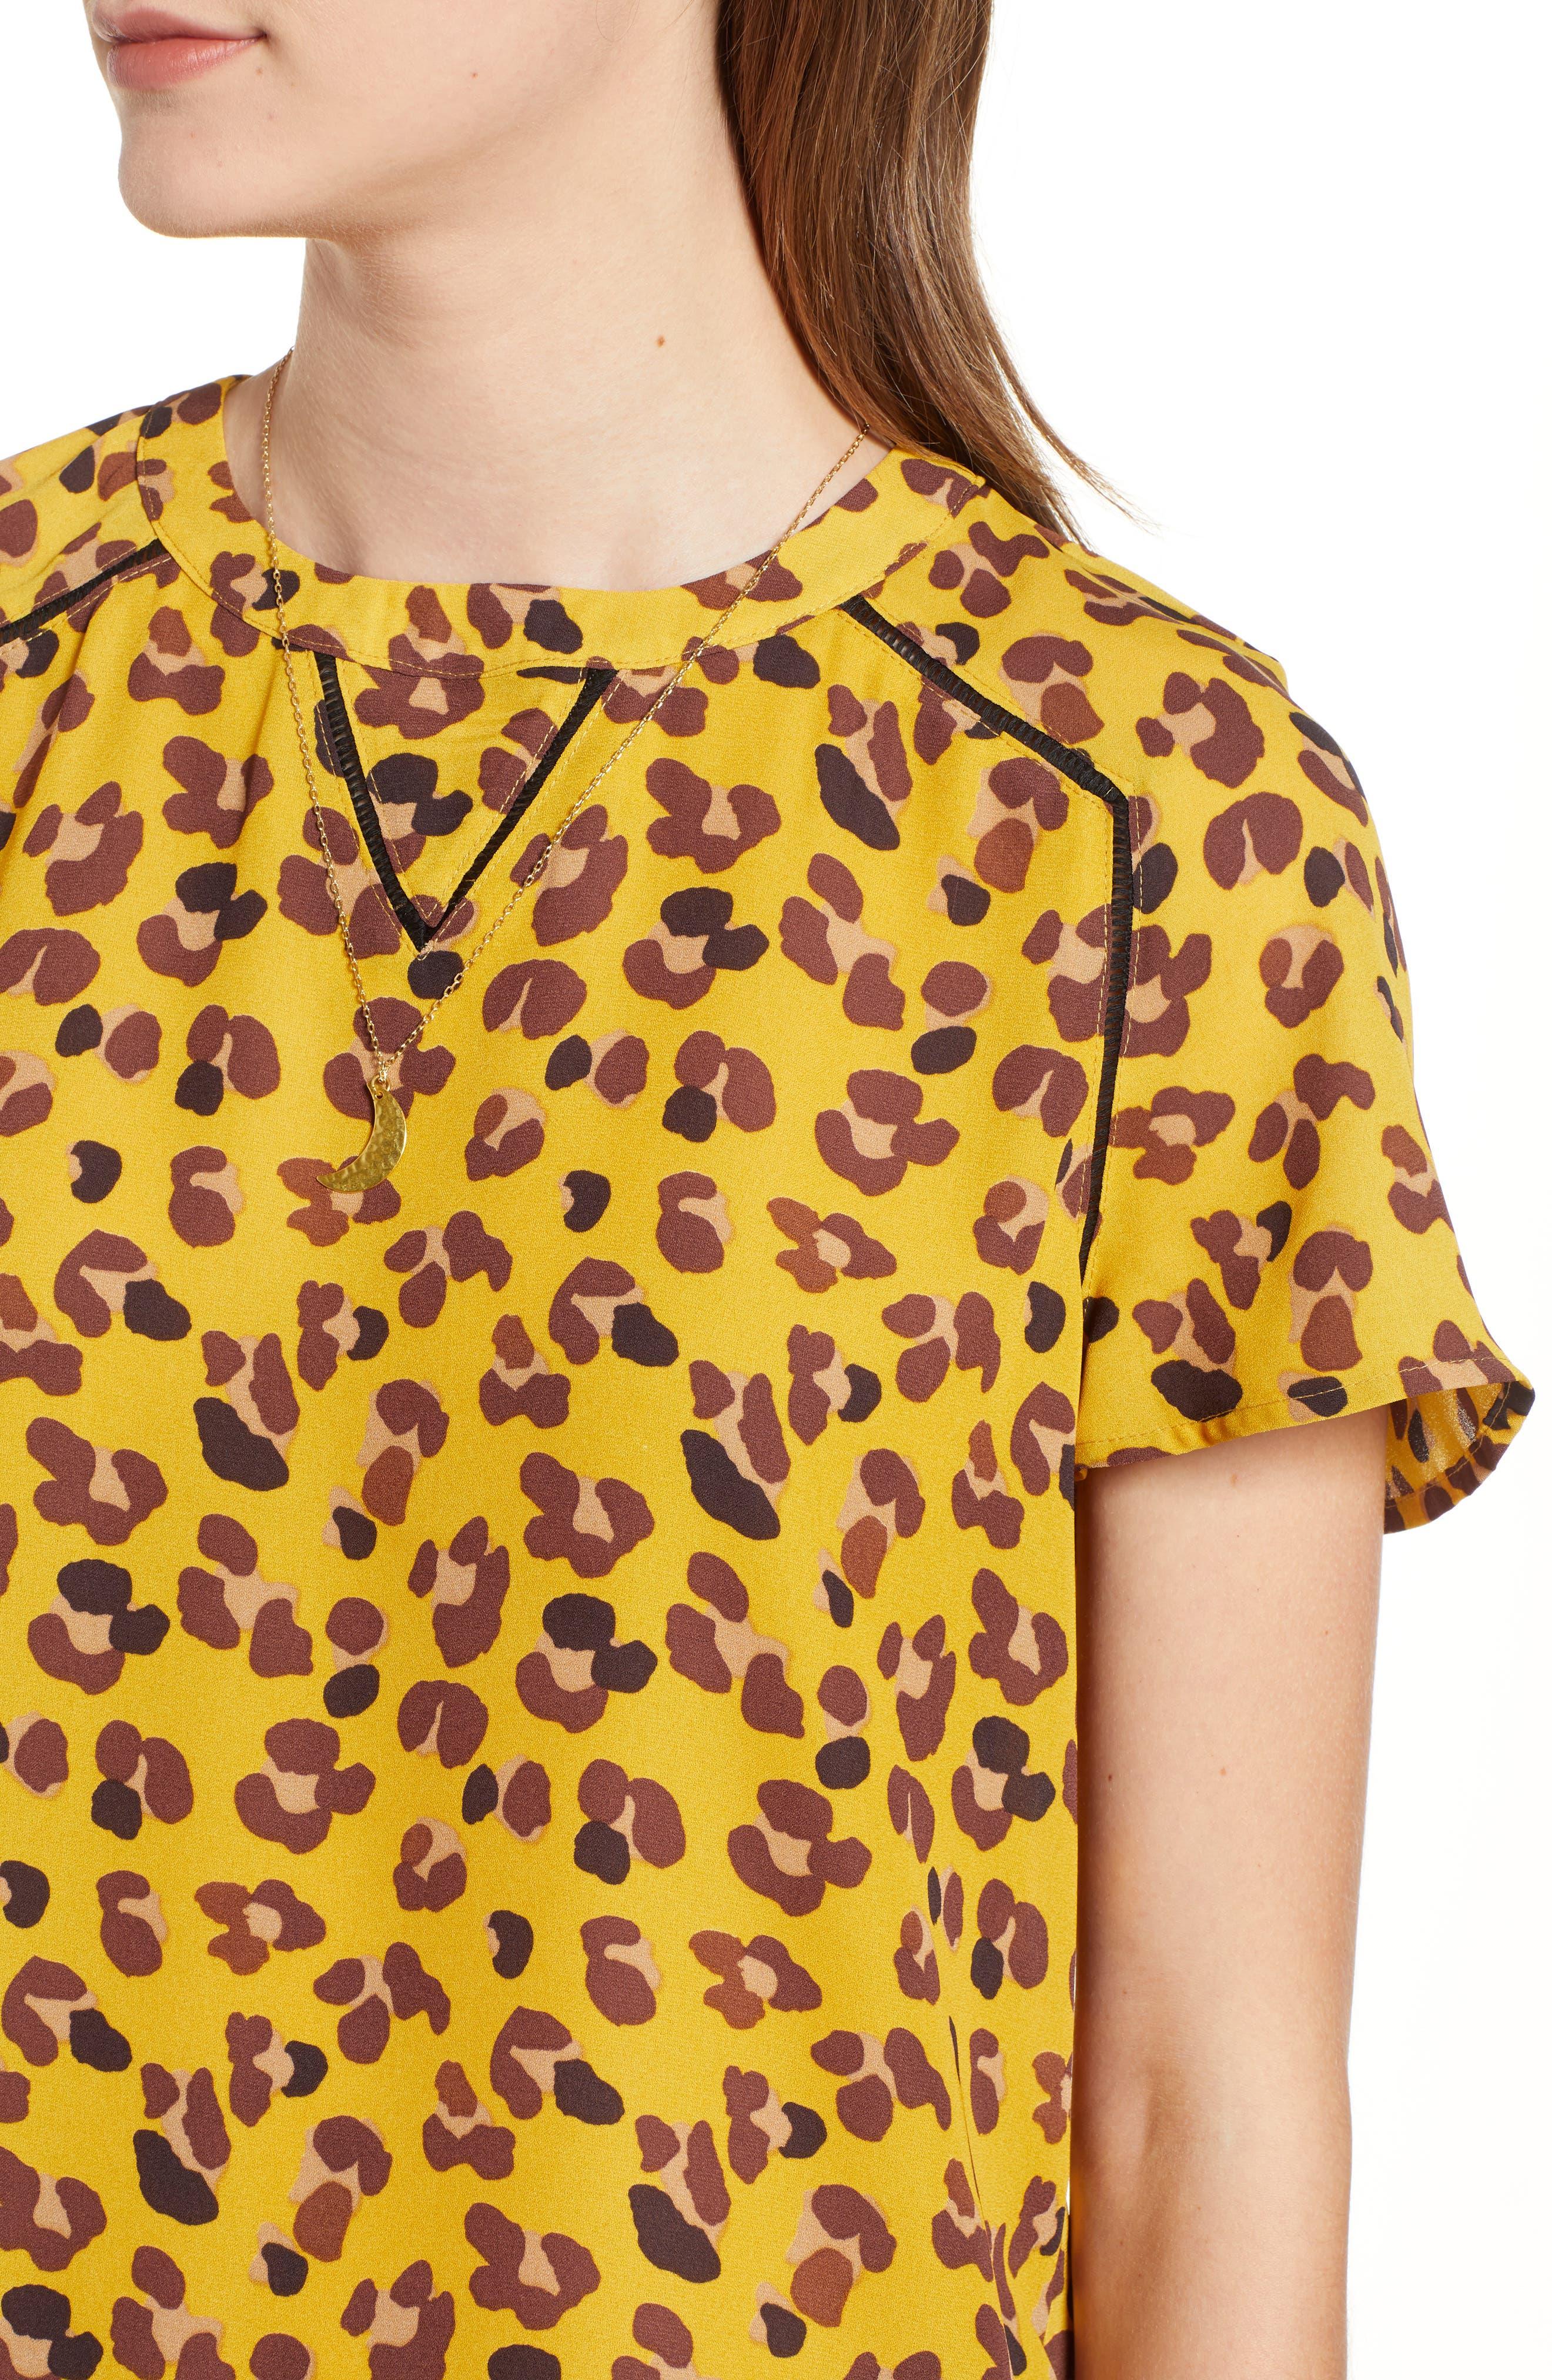 Leopard Print Top,                             Alternate thumbnail 4, color,                             YELLOW LEOPARD PRINT